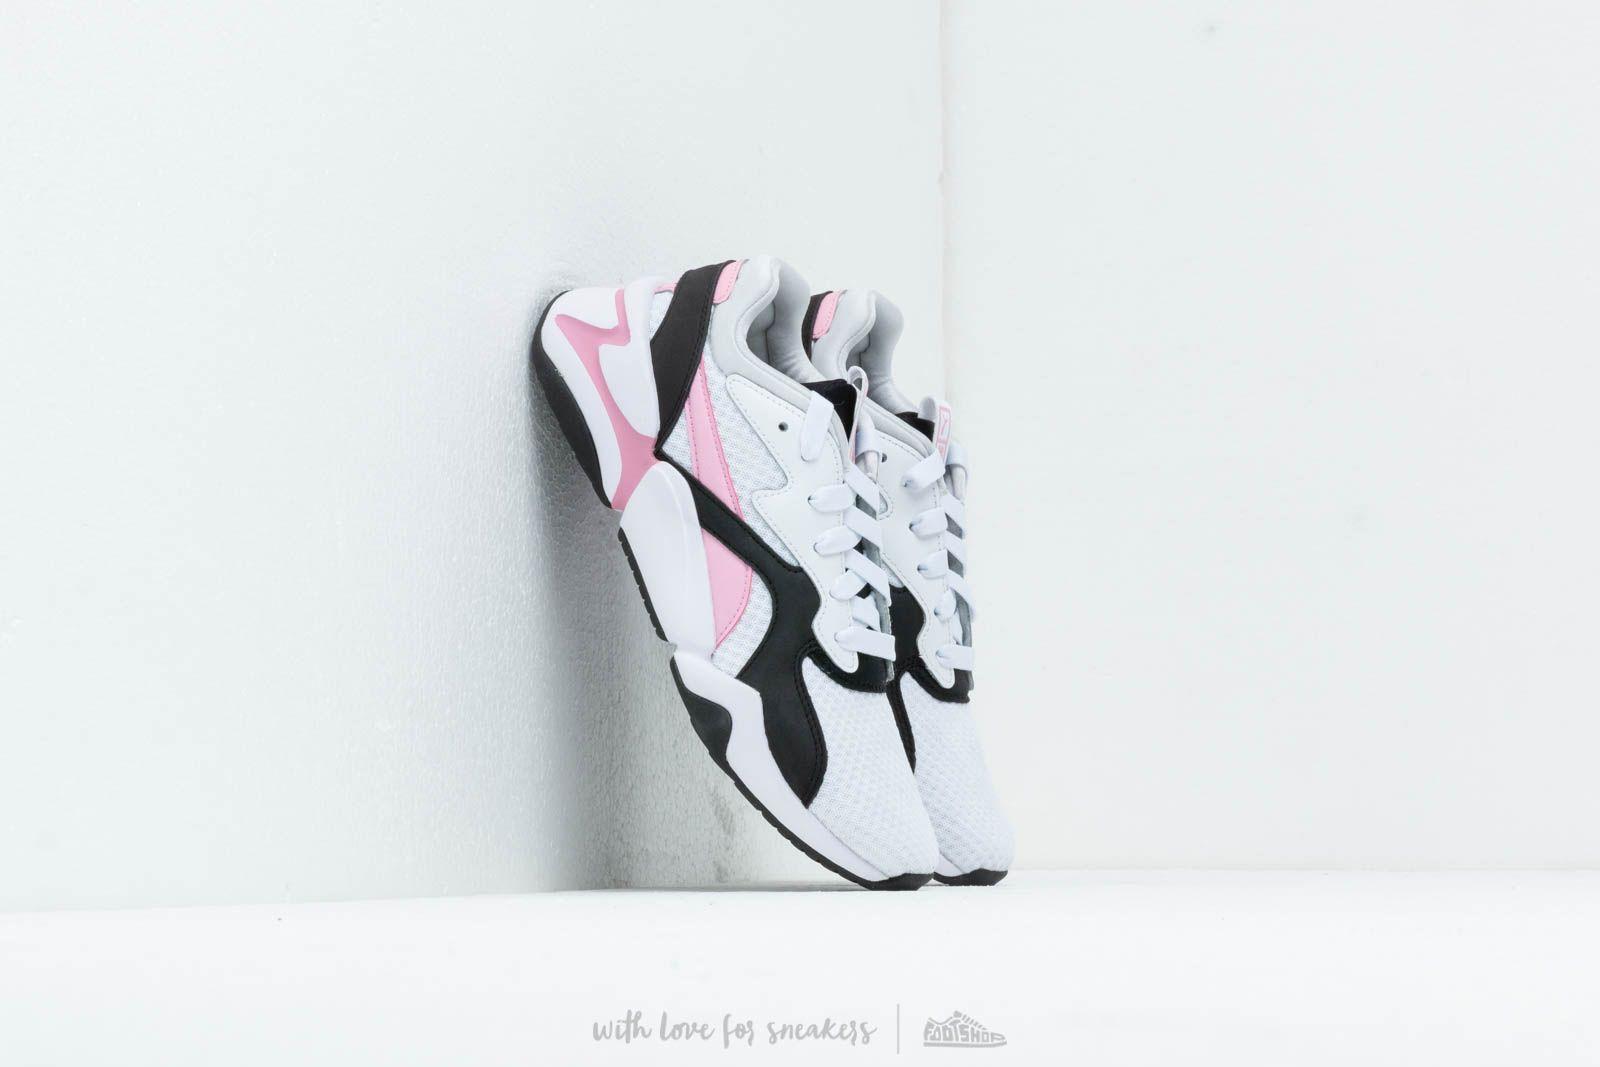 Dámské tenisky a boty Puma Nova 90's Bloc Wn's Puma White/ Pale Pink